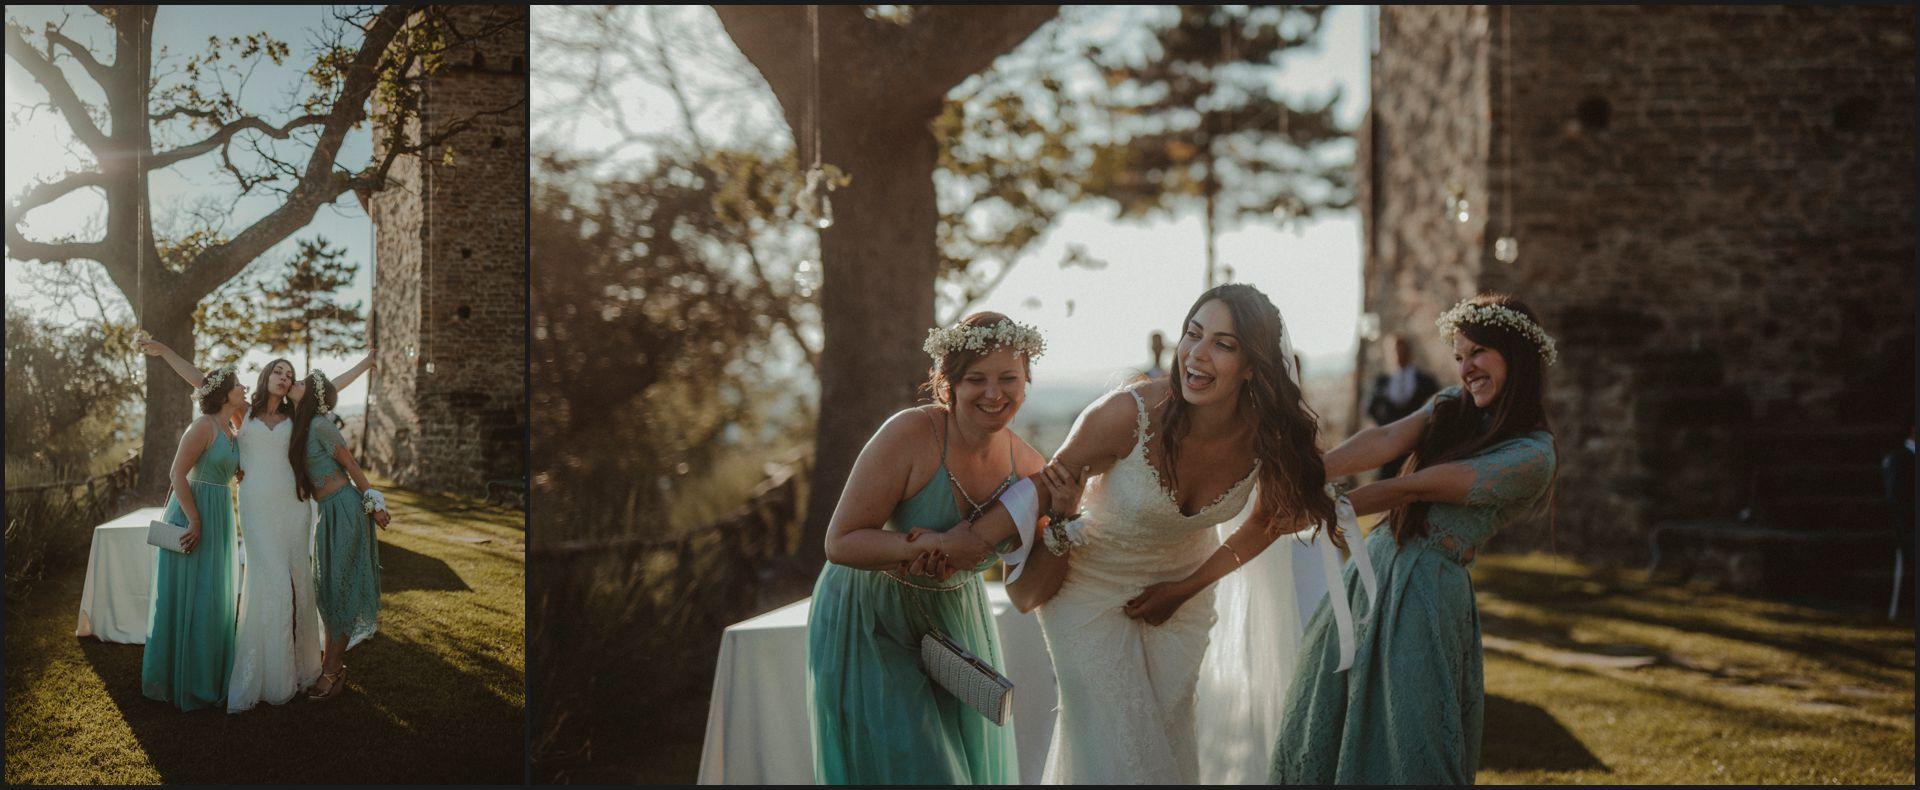 bridemaids, bride, wedding, funny pictures, wedding, umbria, nikis resort